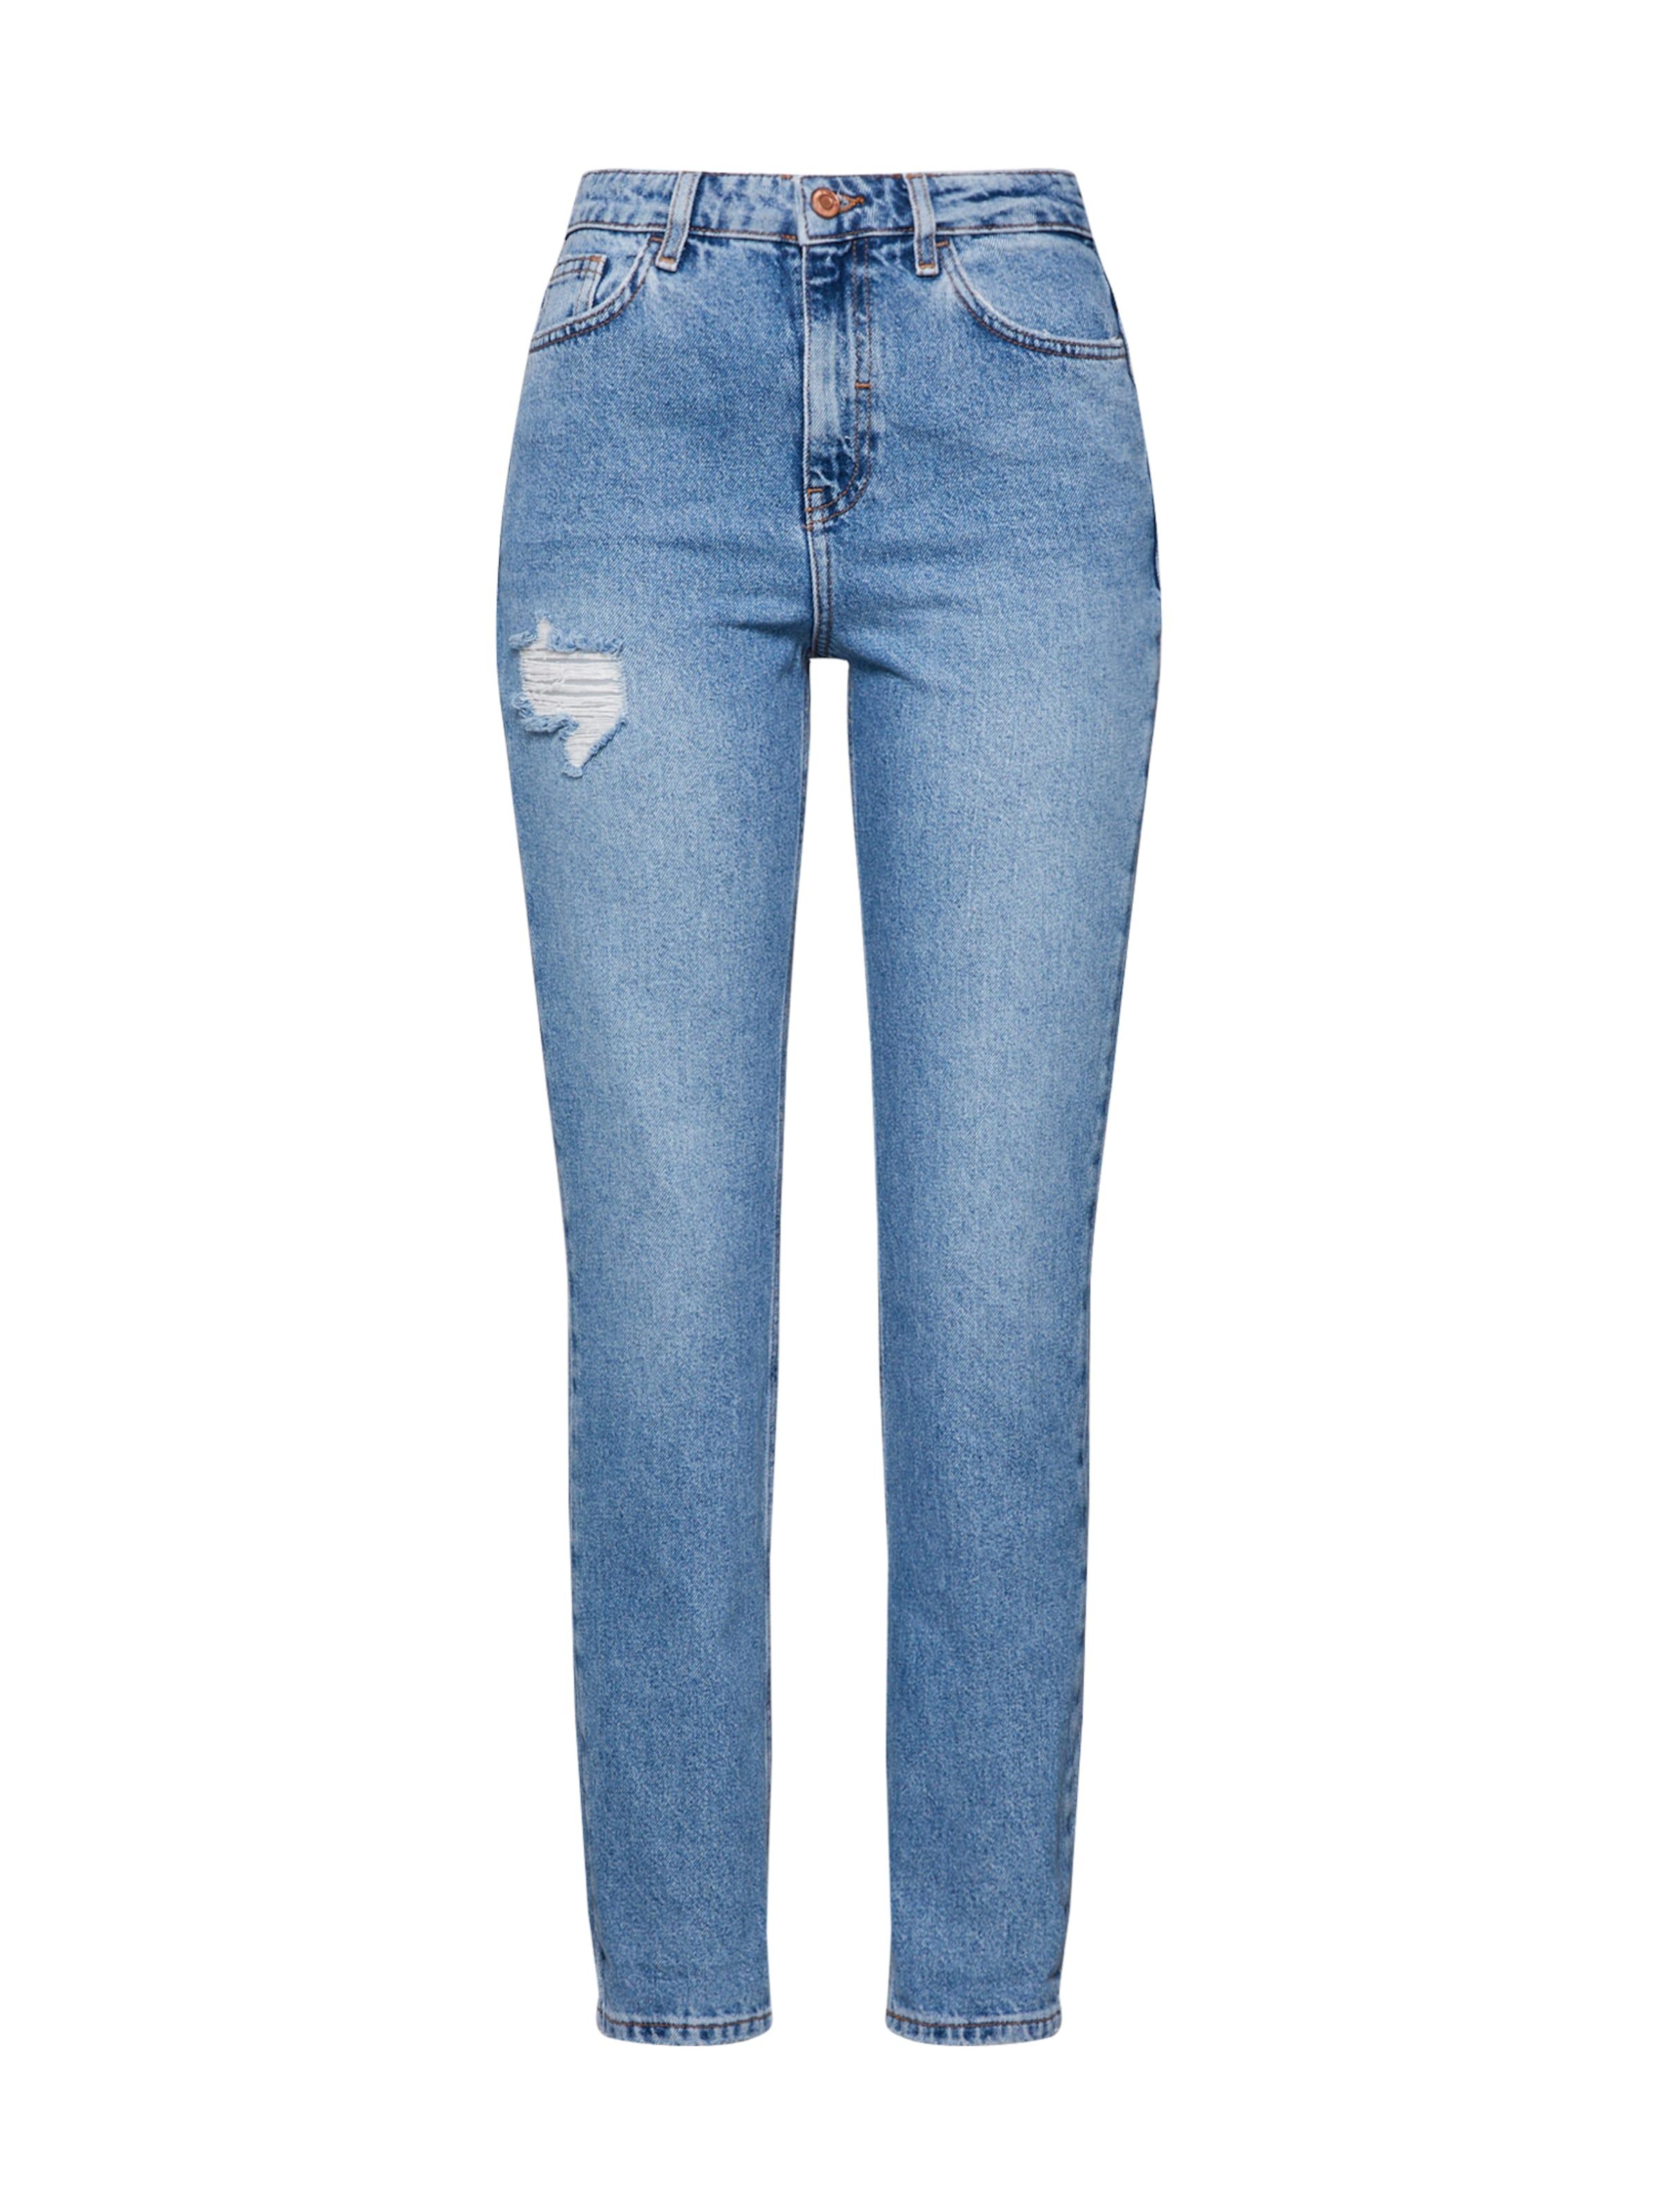 En Look New En Bleu Look Bleu New Jean New Jean w8mNn0